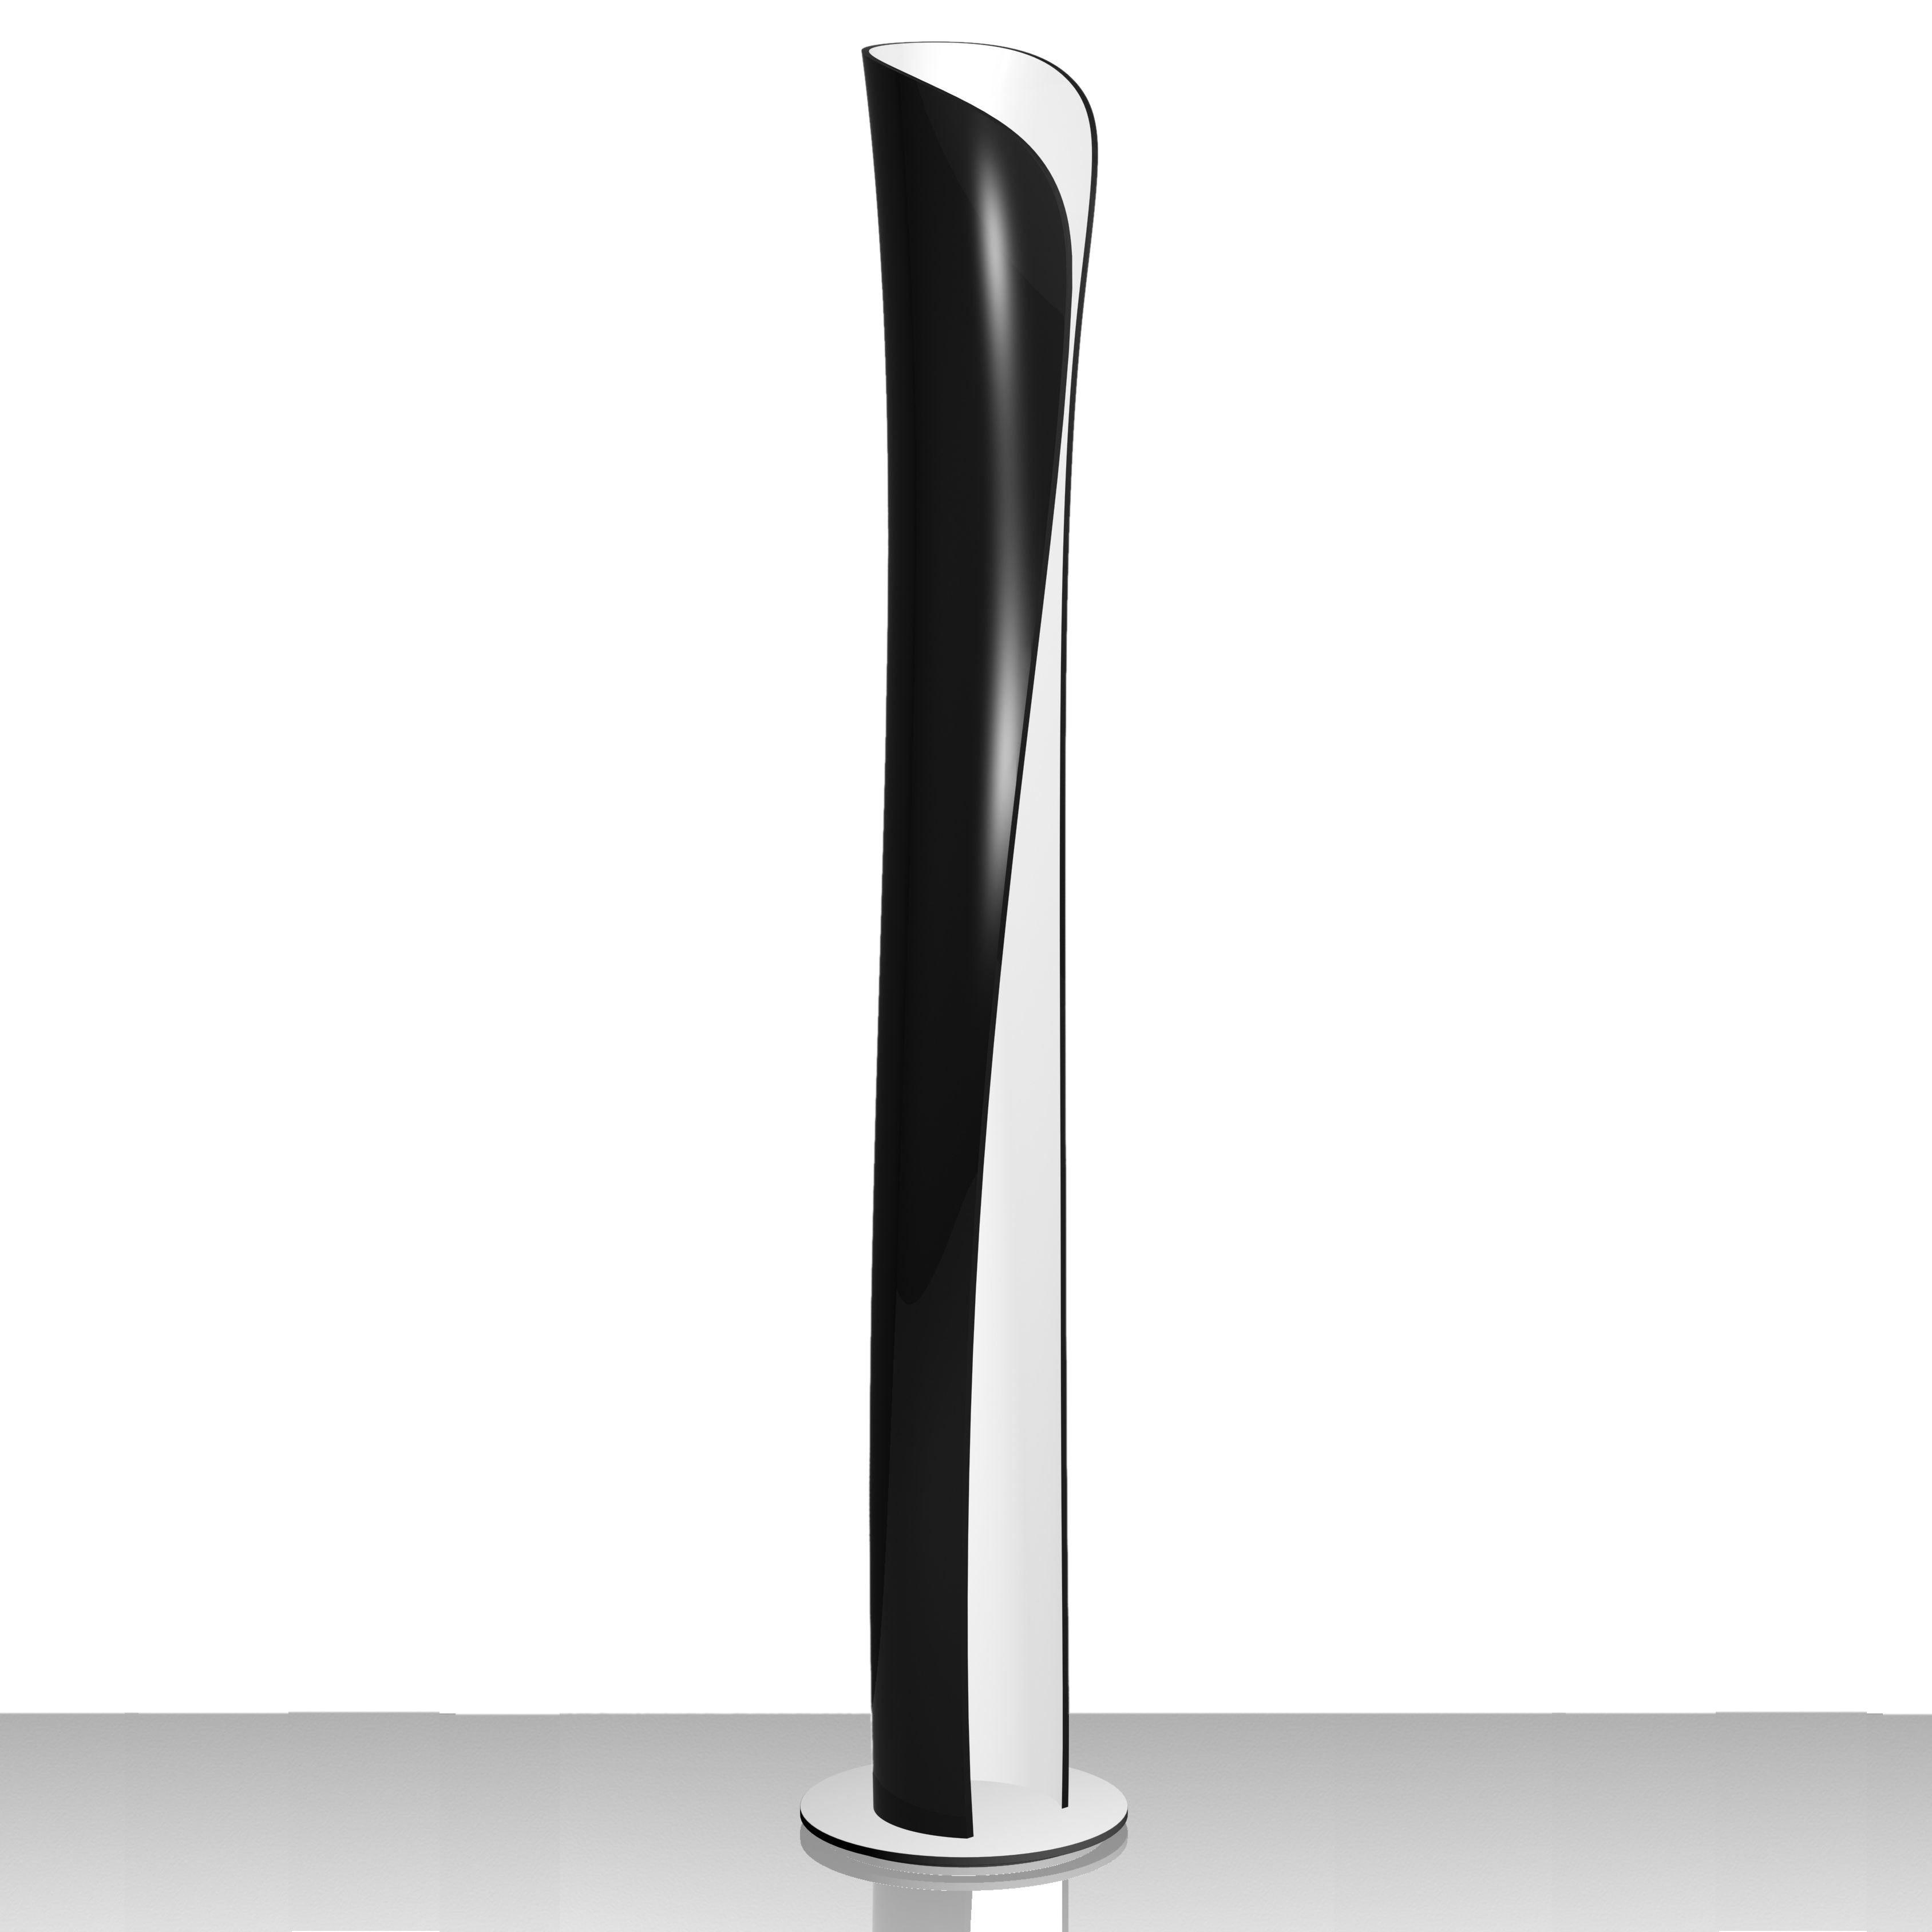 Nero esterno / Bianco Interno - +97,03US$